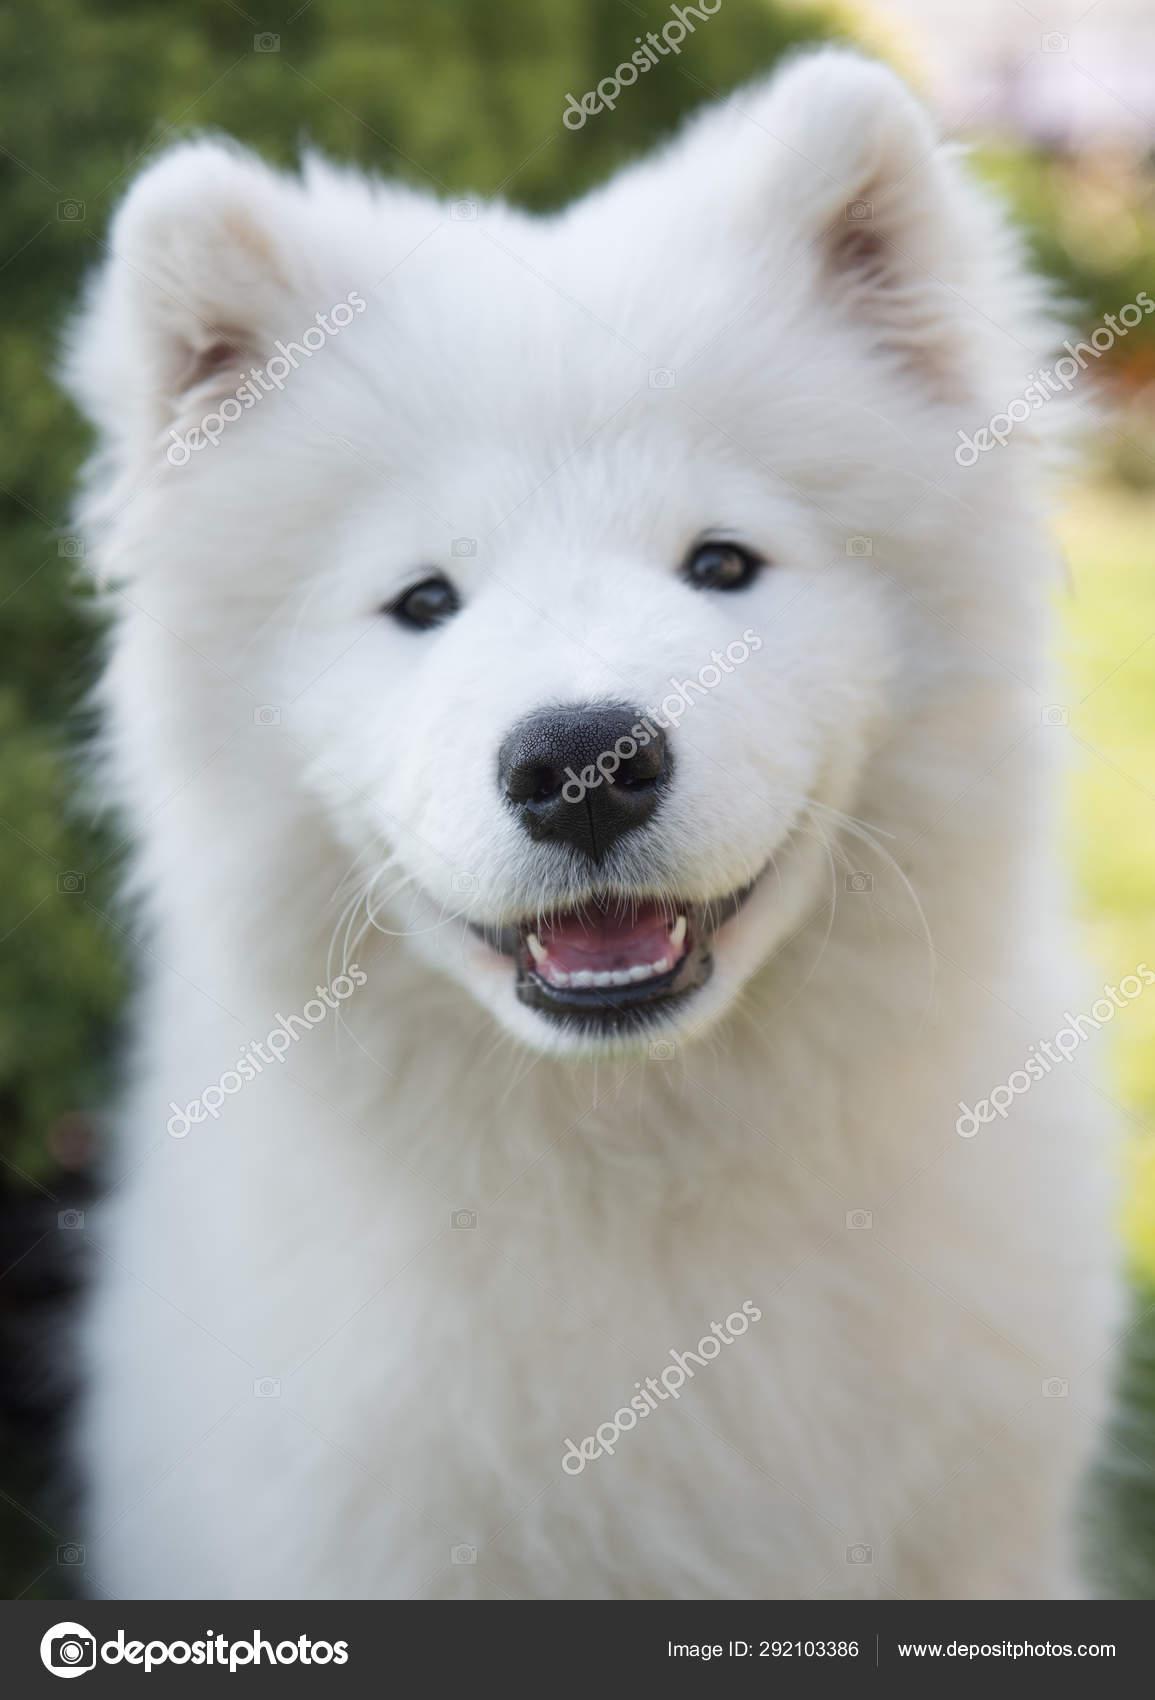 White Samoyed Puppy Dog Smiles Muzzle In The Garden On The Green Grass Stock Photo C Zannaholstova 292103386